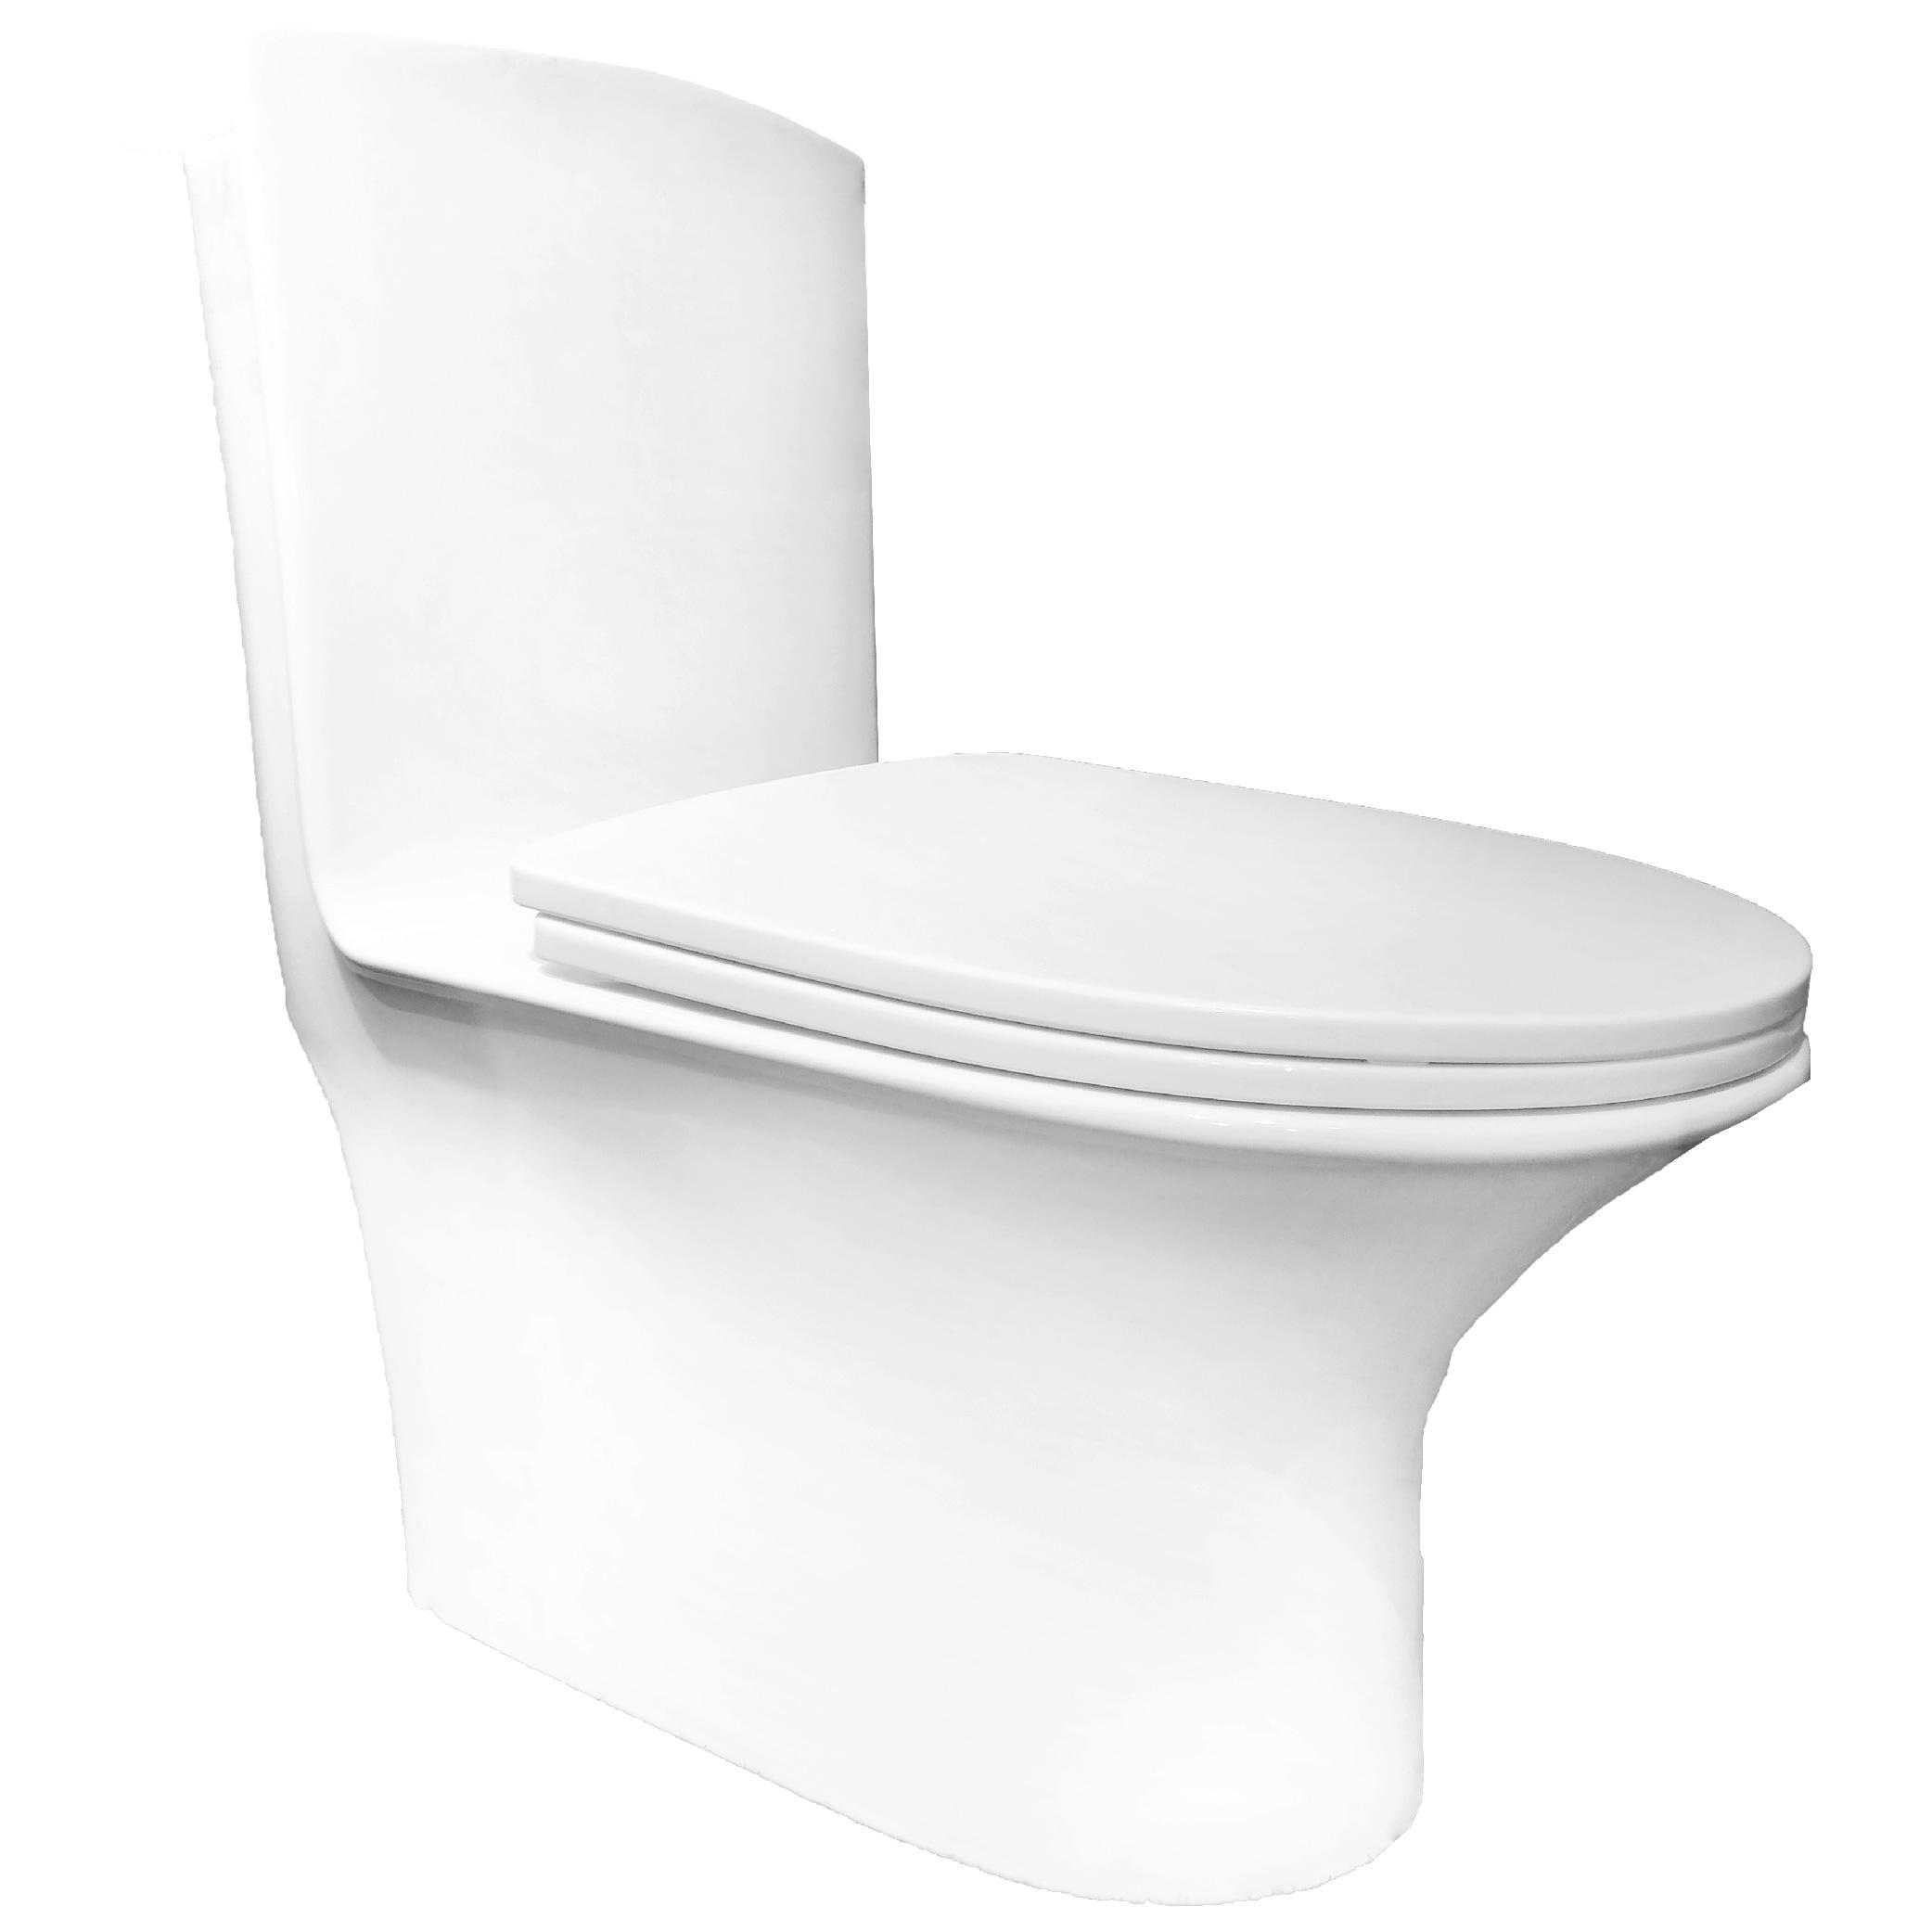 BỒN CẦU NOUVO 1 KHỐI N06KT ( Toilet model: N06KT)